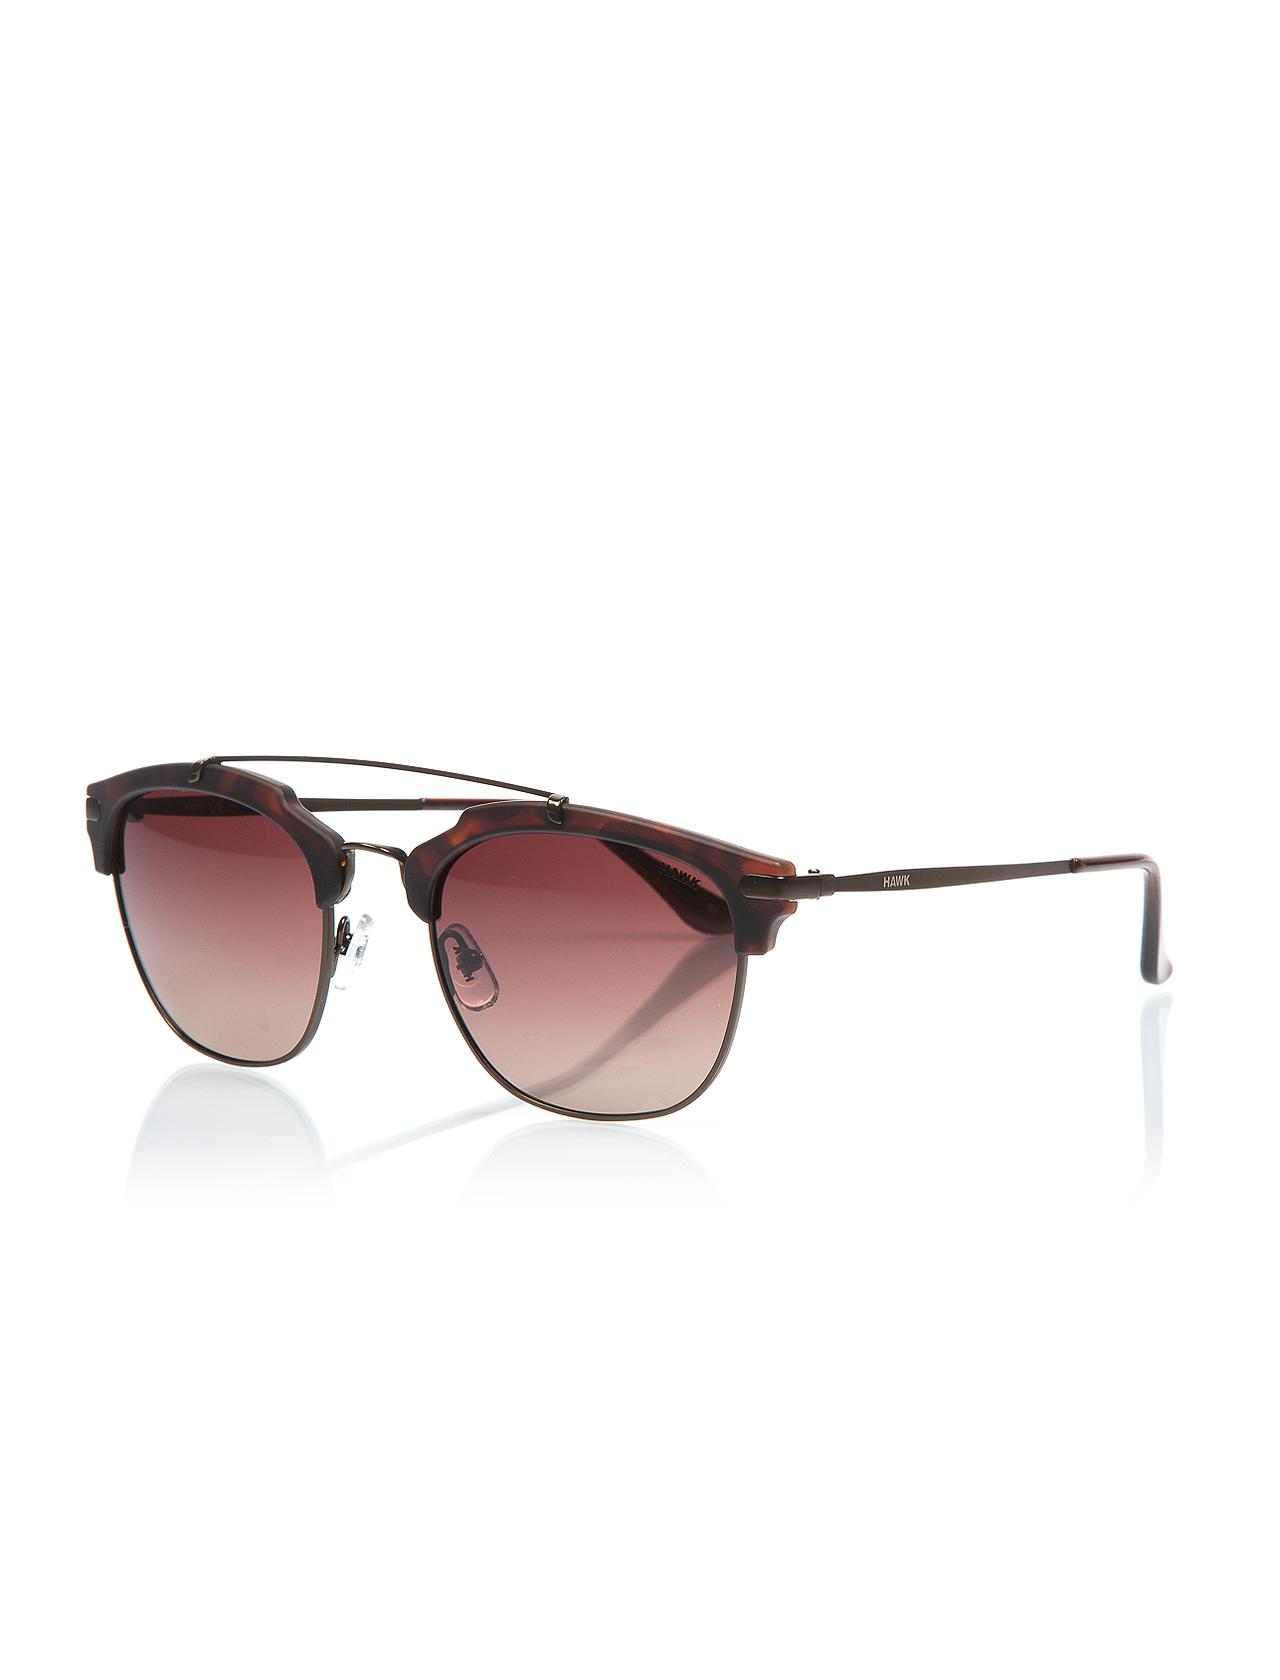 Unisex Semi Frame Sunglasses